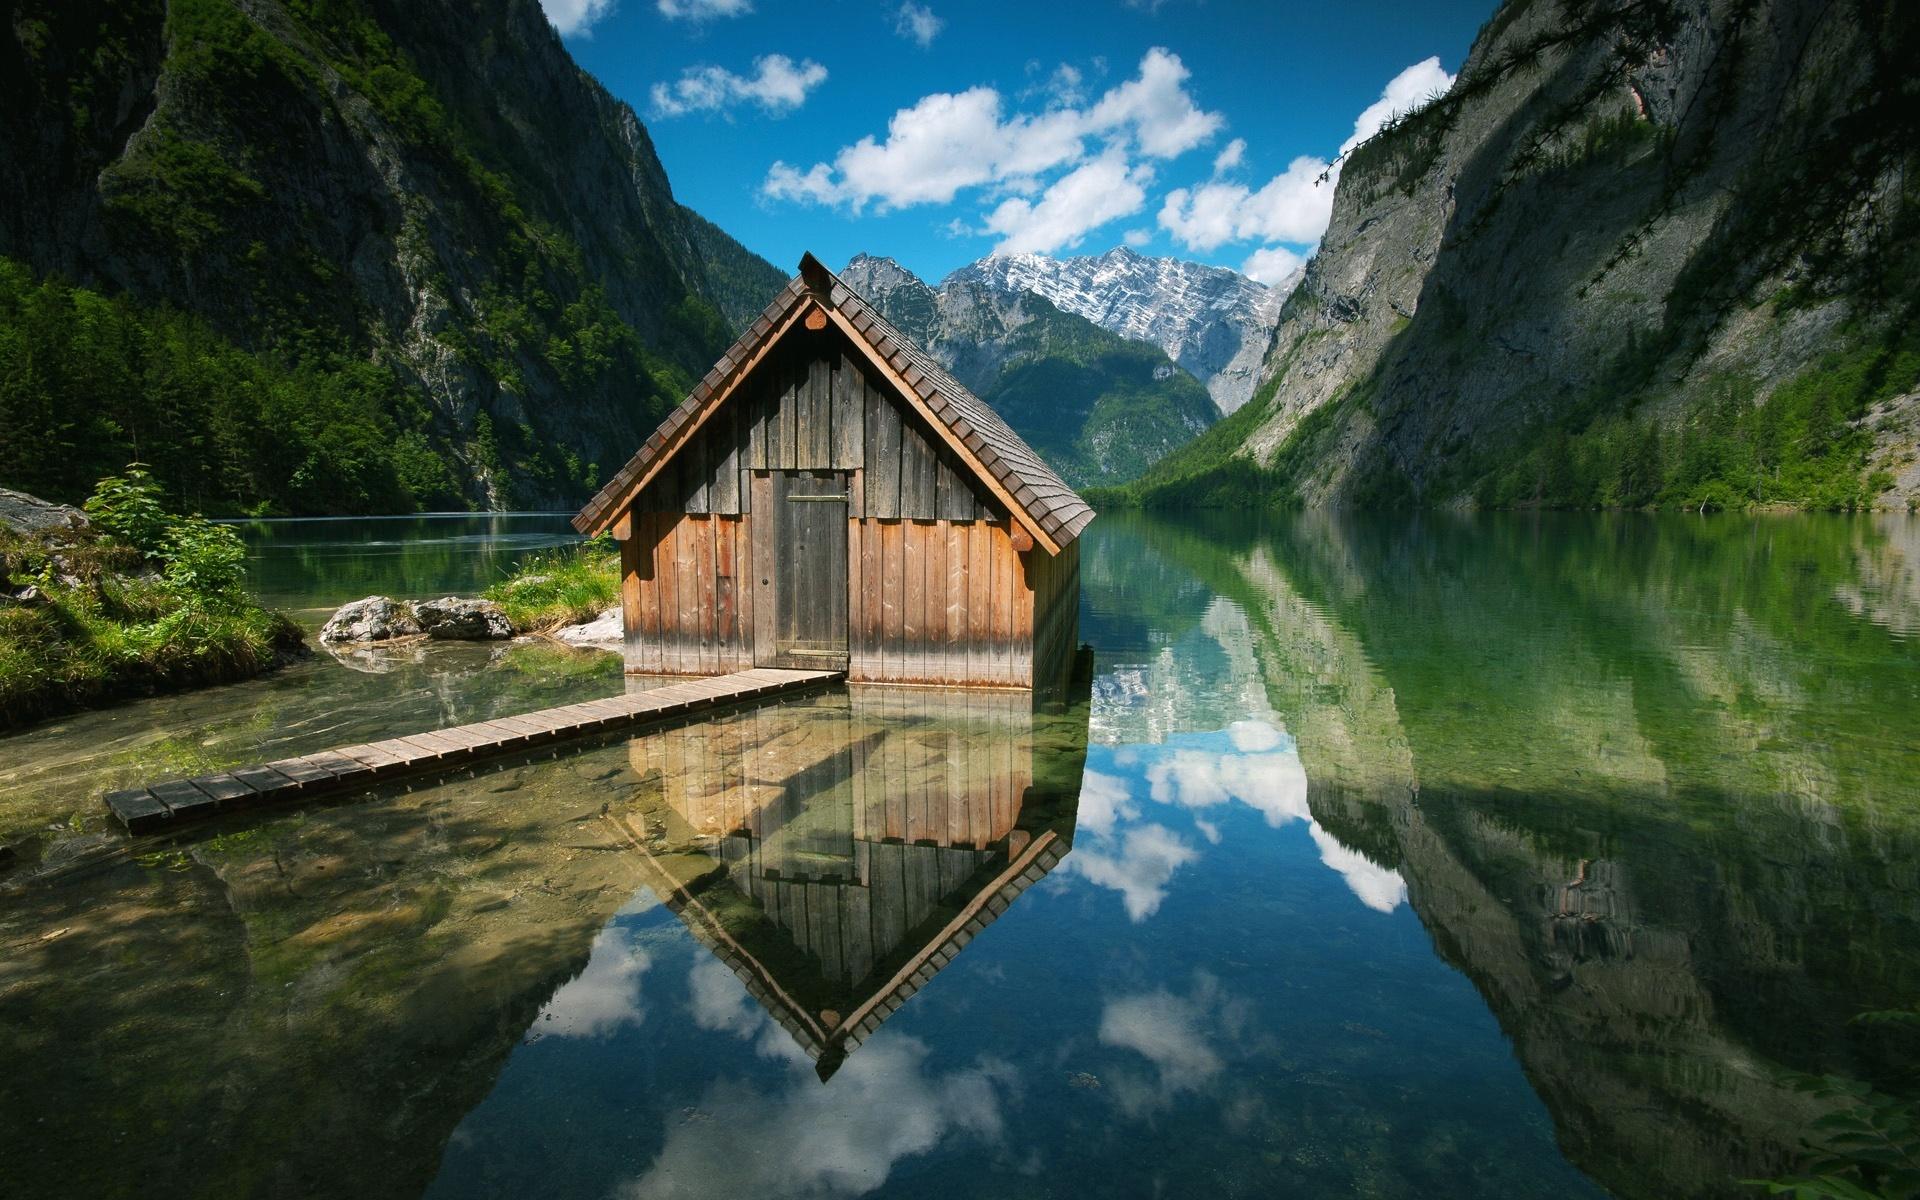 Lakeside mountain cabin wallpaper   792085 1920x1200